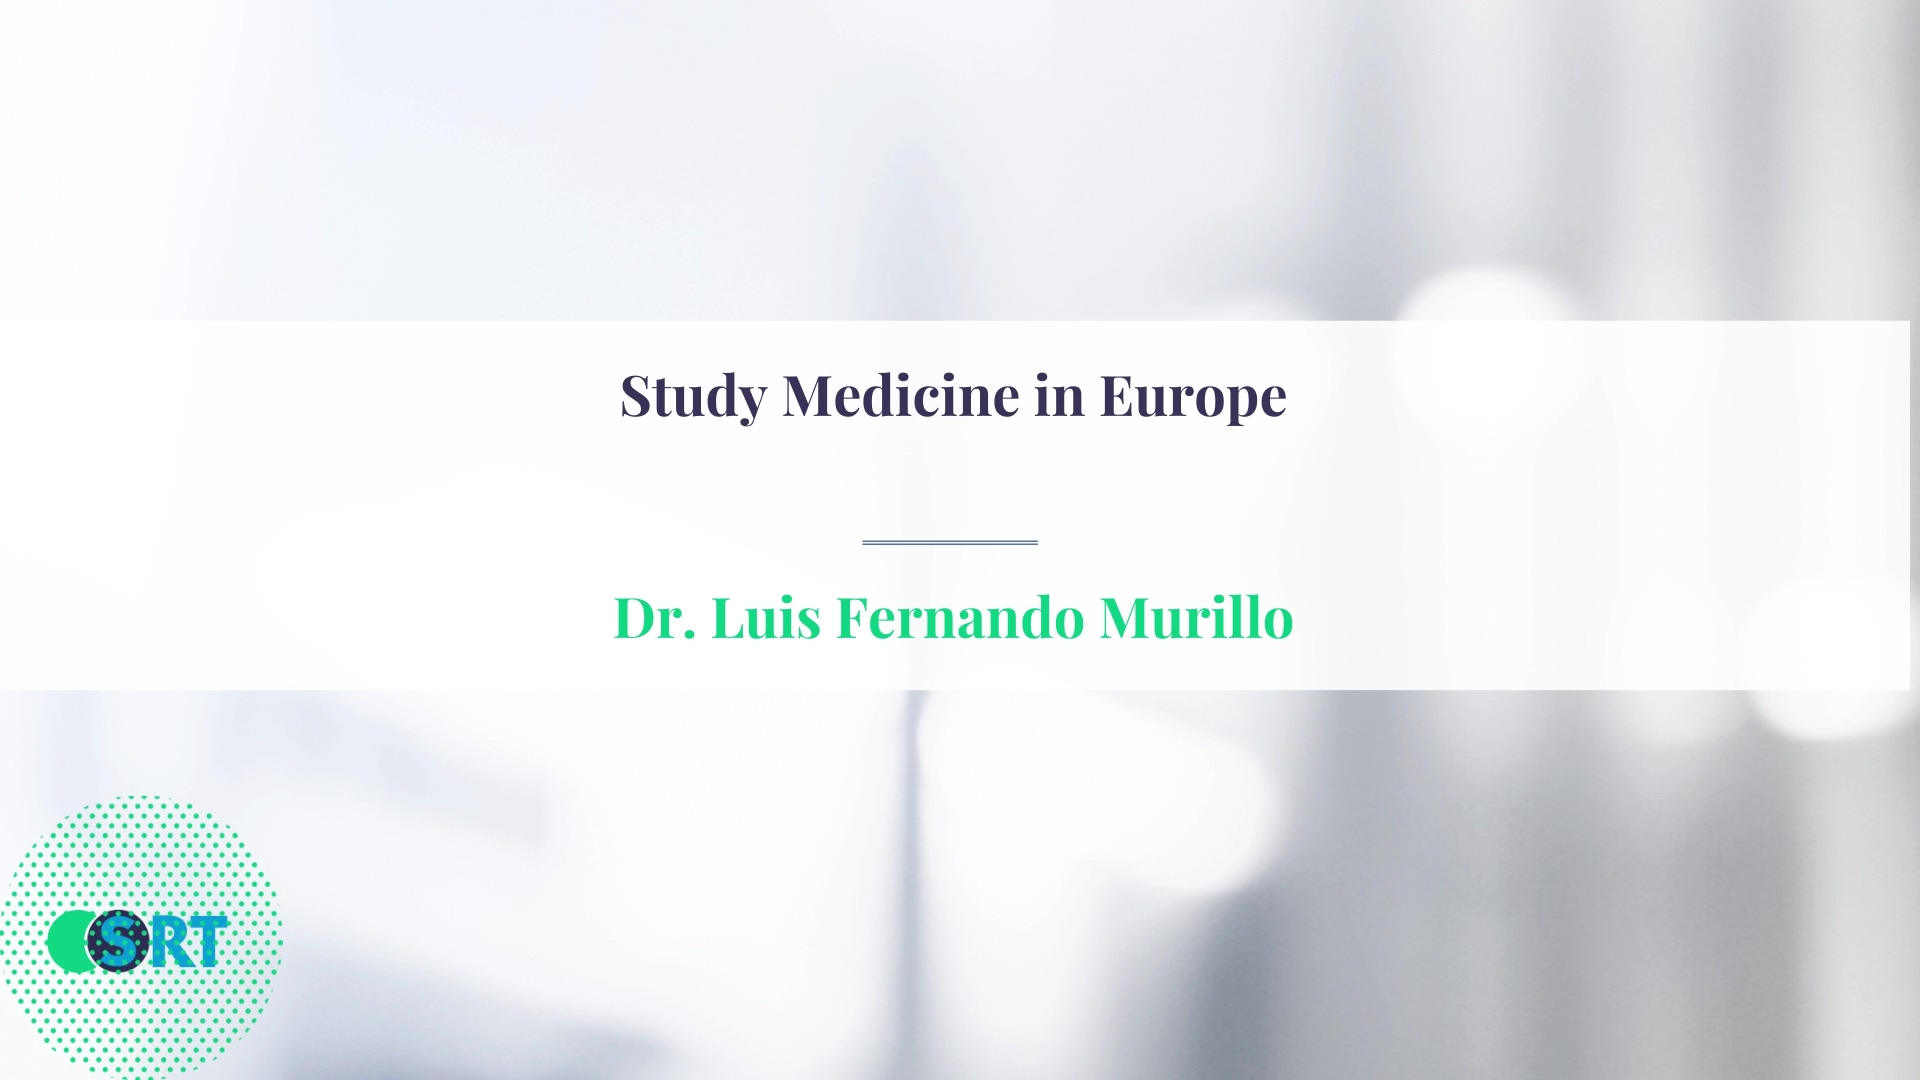 Study Medicine in Europe